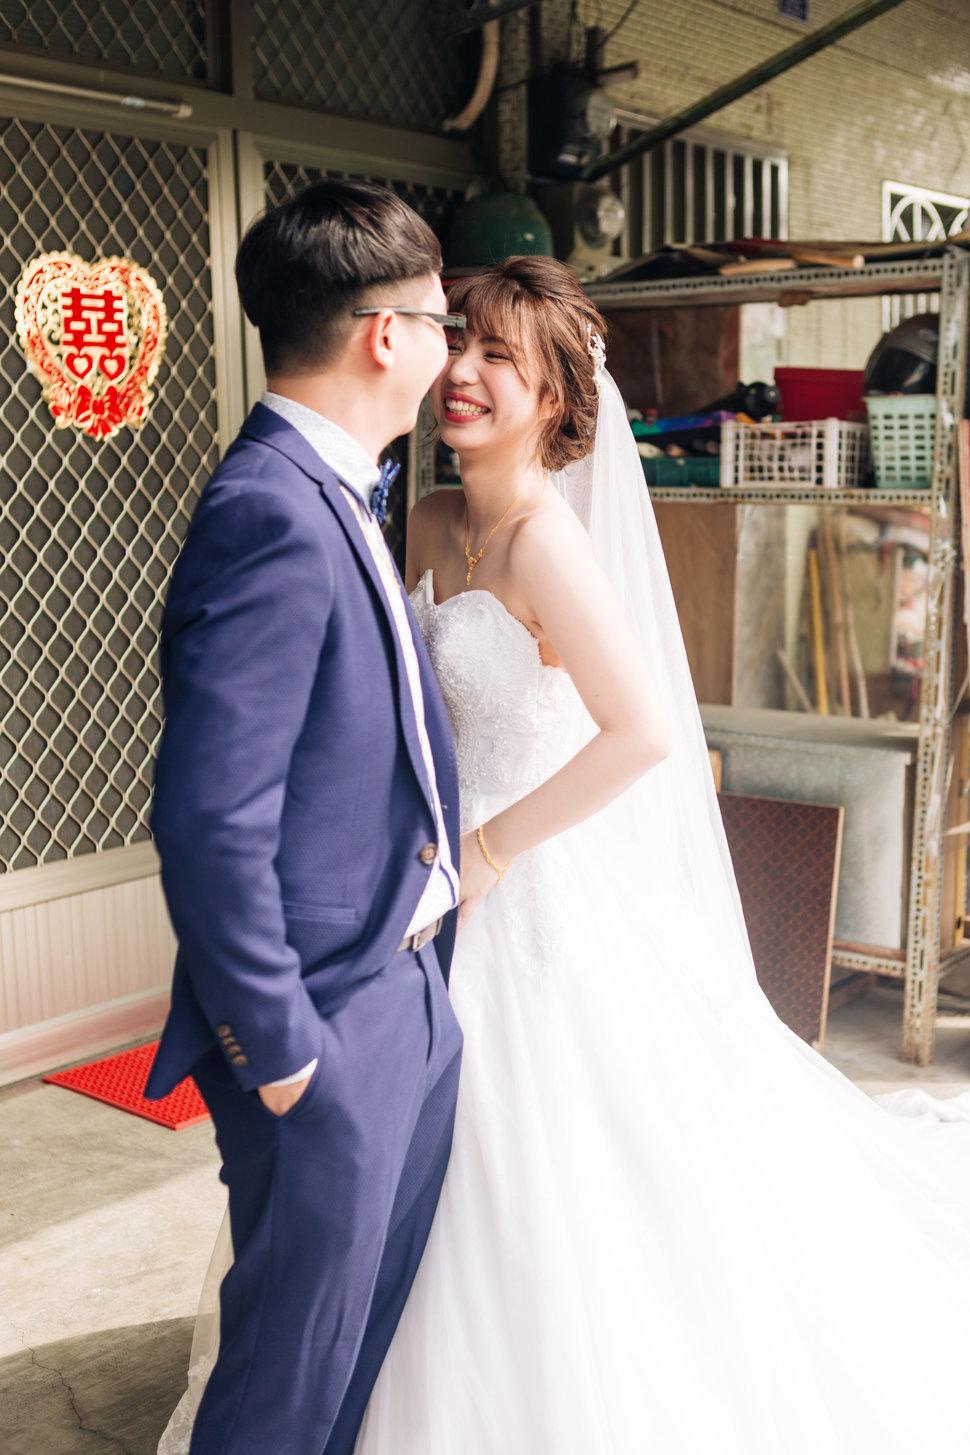 IMG_9048 - syuan影像紀錄 - 結婚吧